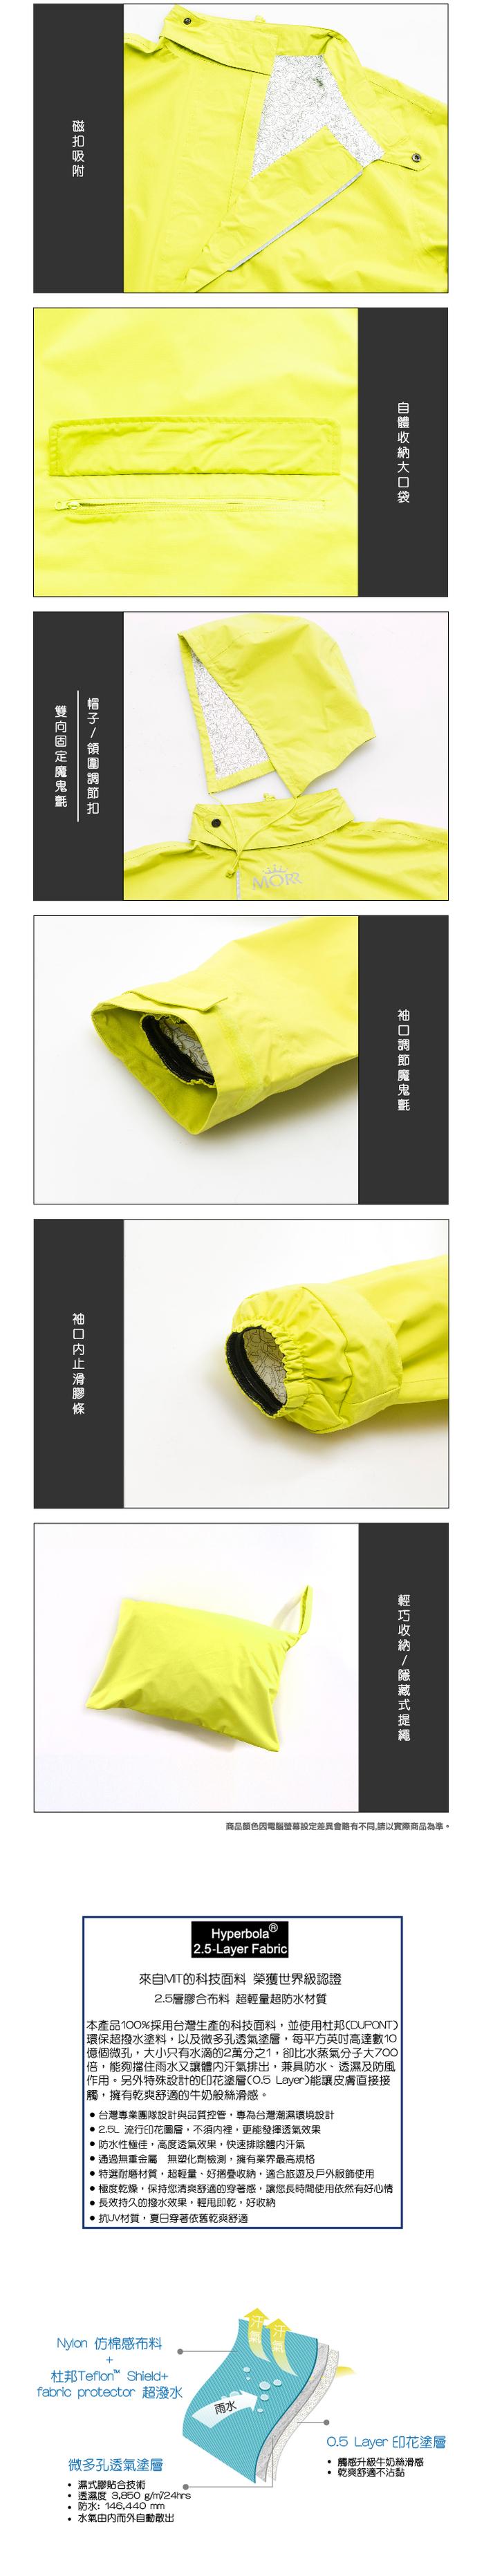 (複製)MORR Postshorti 磁吸式反穿防水外套(拿鐵咖)